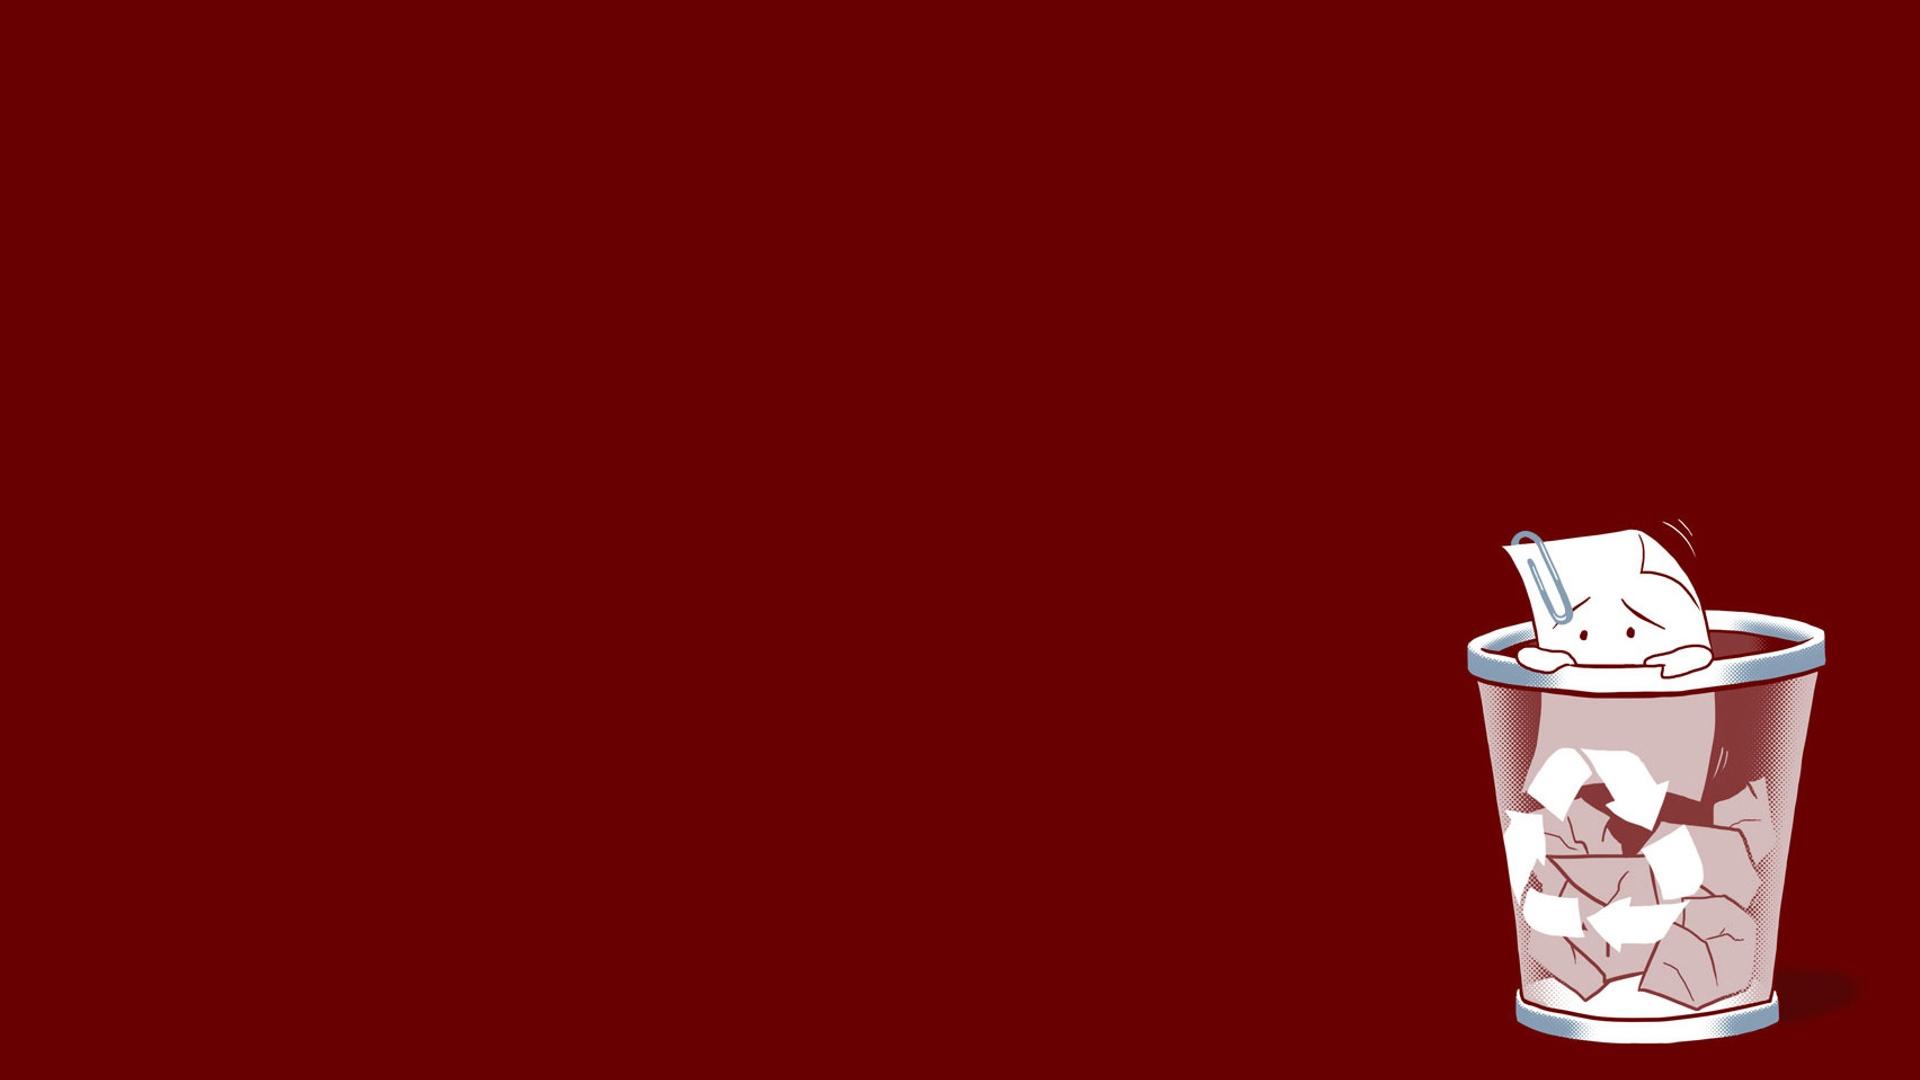 Wallpaper Red Drink Trash Liquid Funny Computer